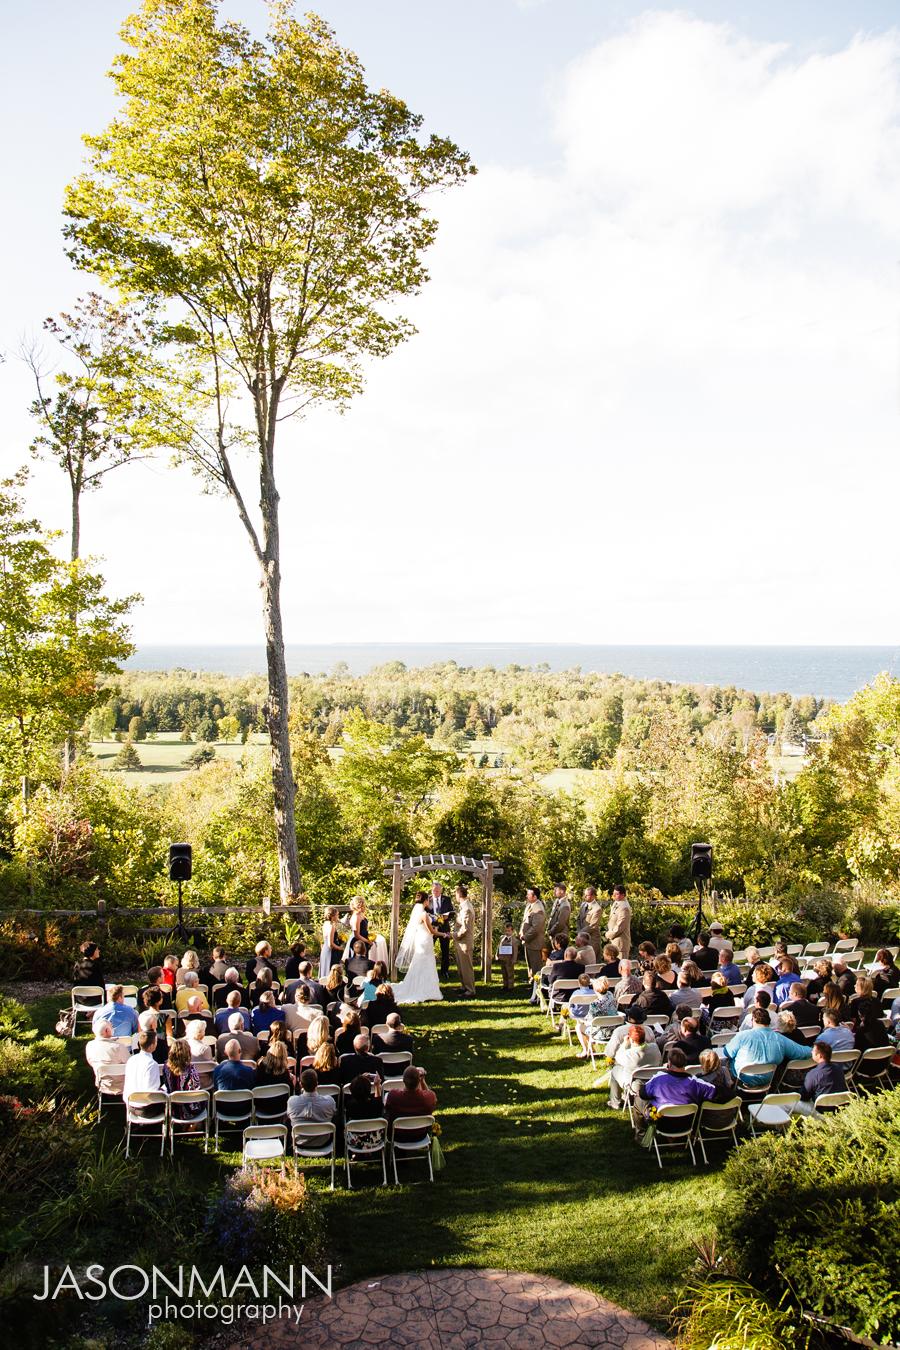 Jason Mann Photography - Door County Wedding at The Landmark Resort